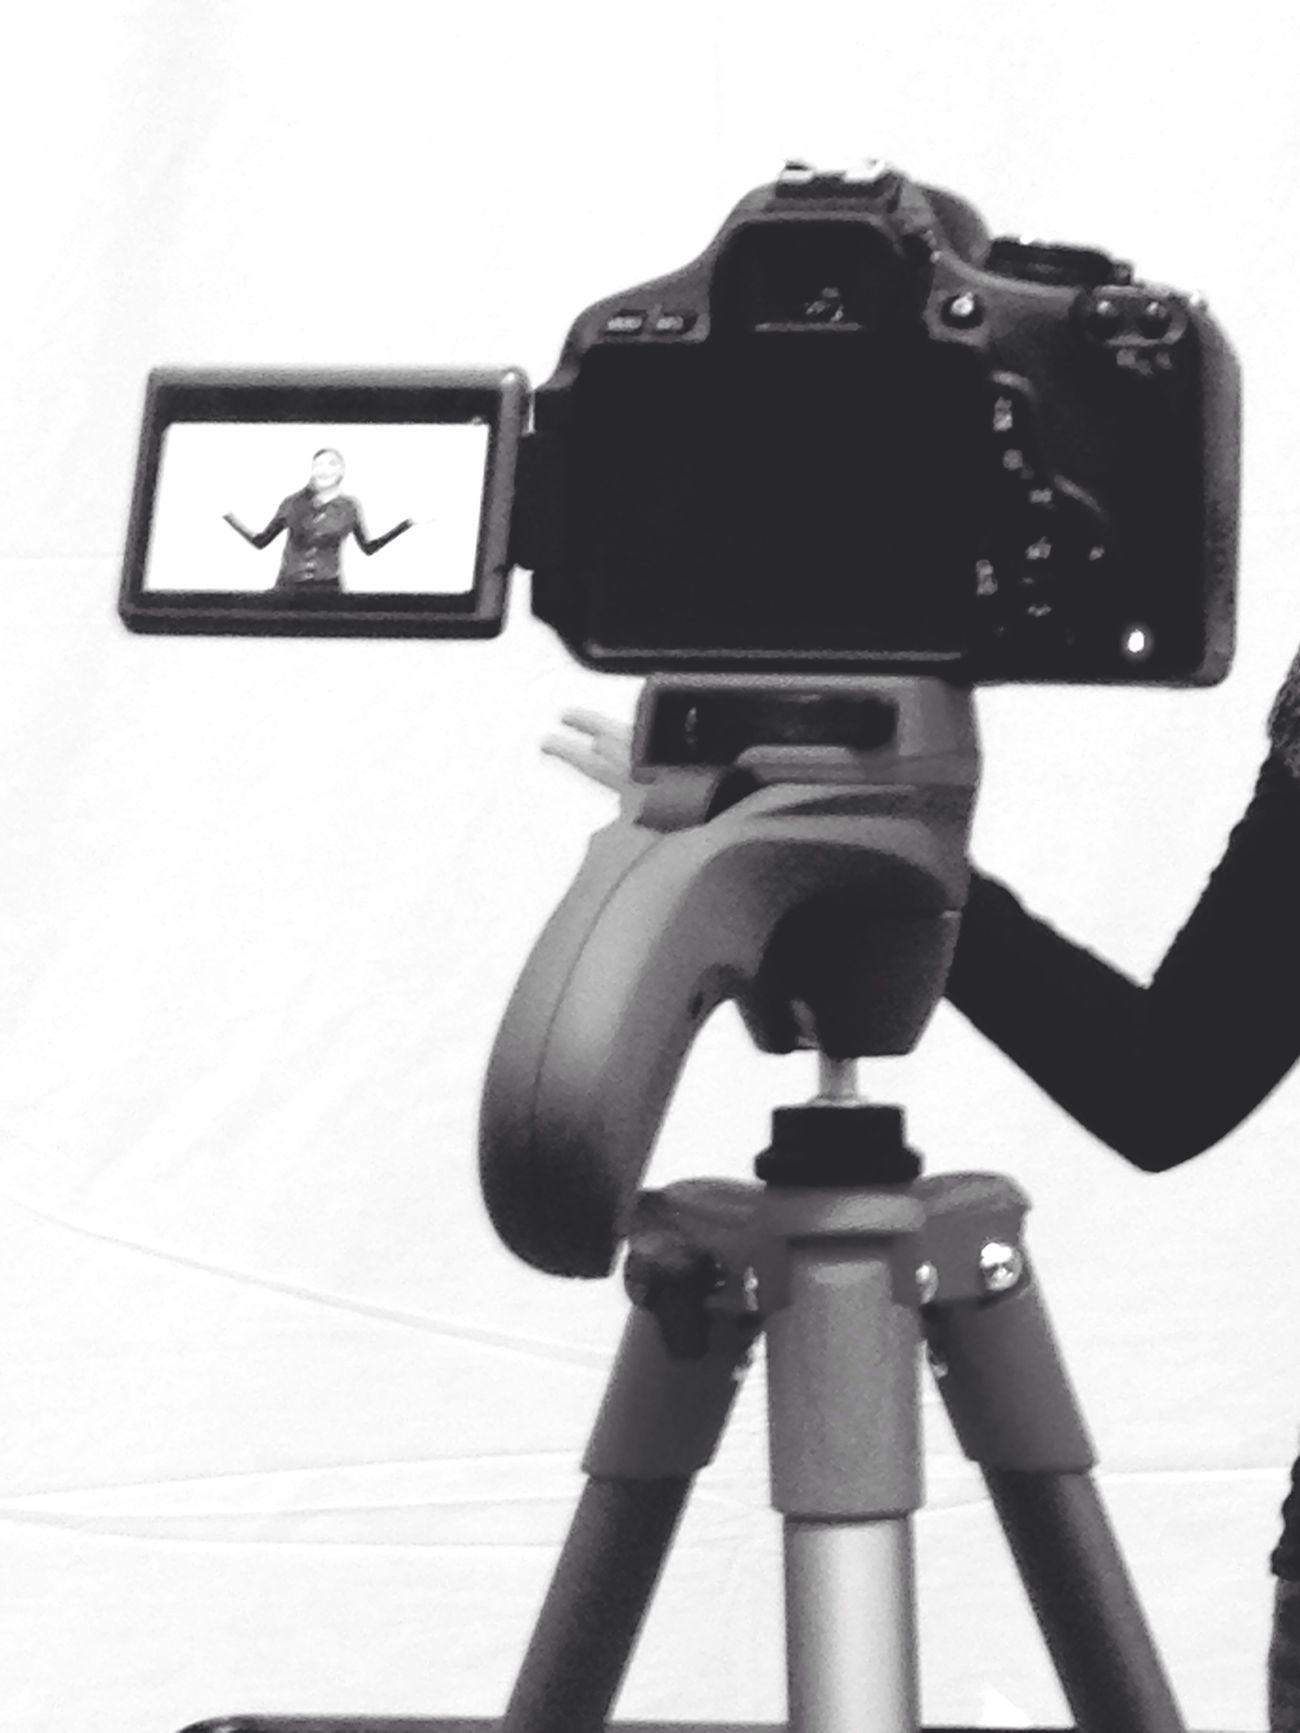 Recording! Recording Camera Cortometraggio Short Film Excited Shooting